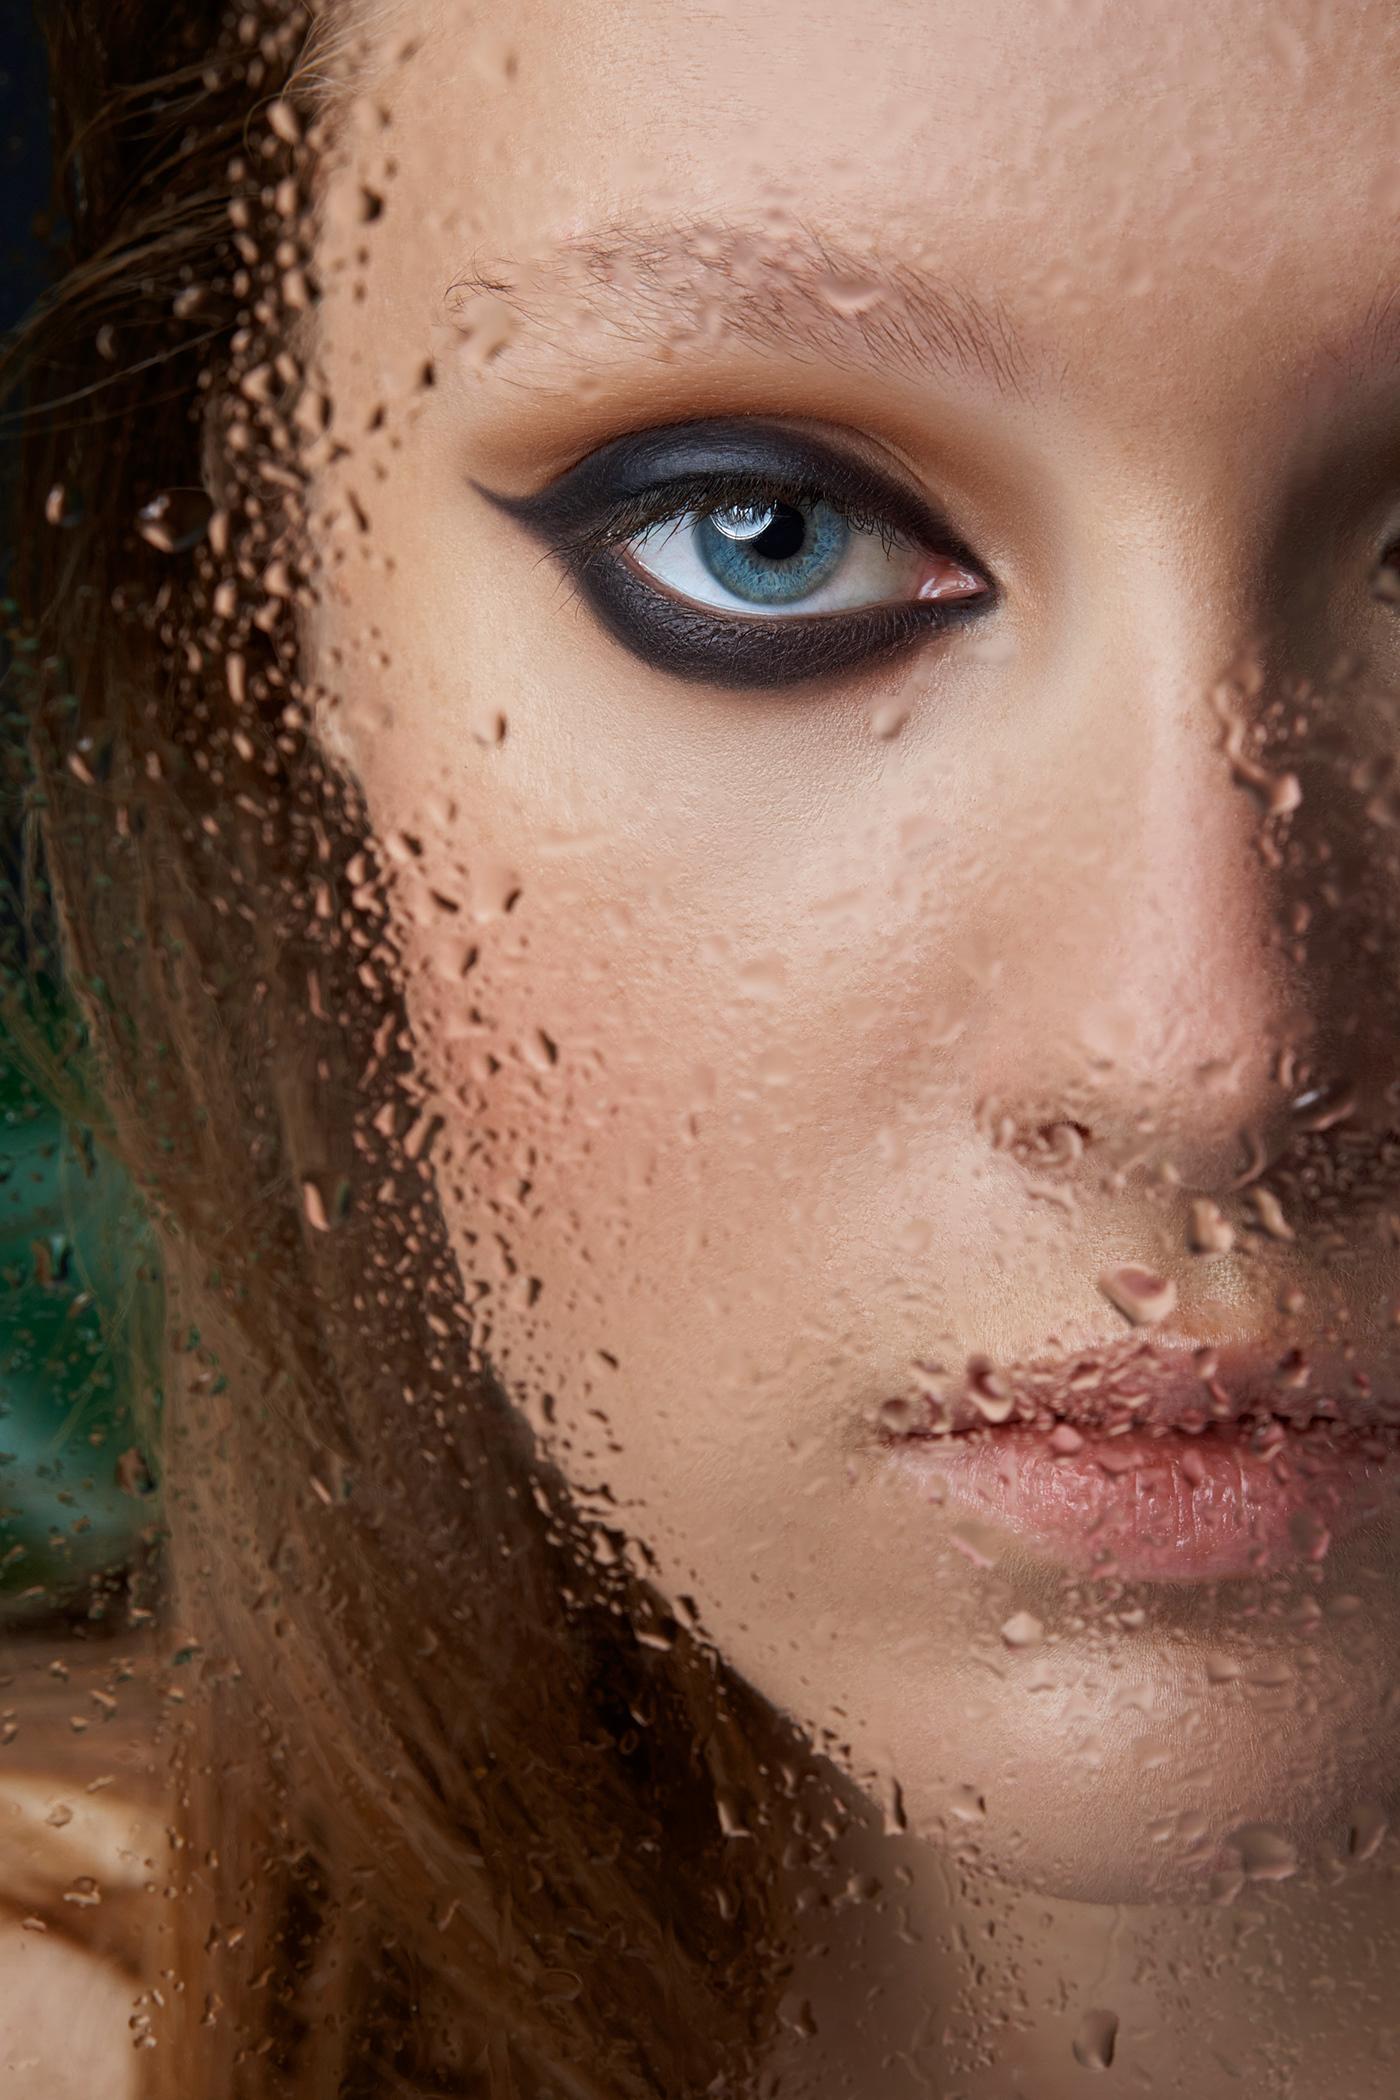 Image may contain: eyes, human face and face